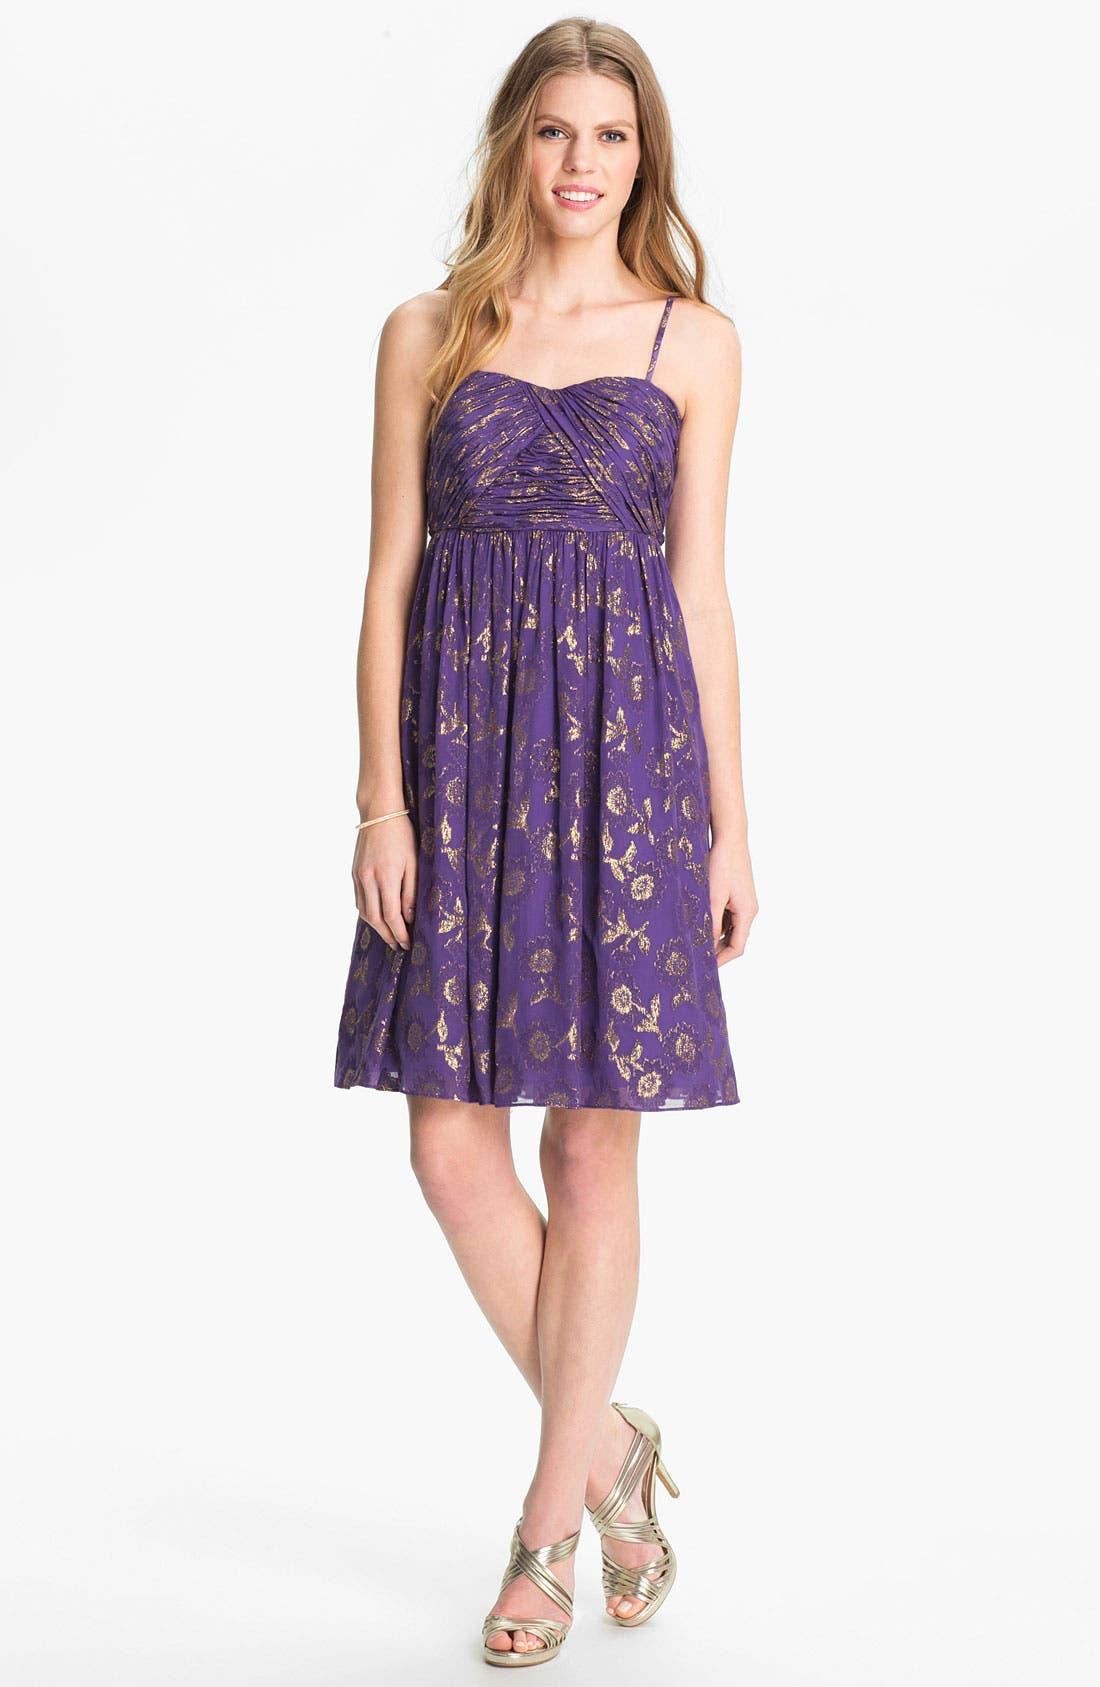 Alternate Image 1 Selected - Calvin Klein Metallic Print Chiffon Dress